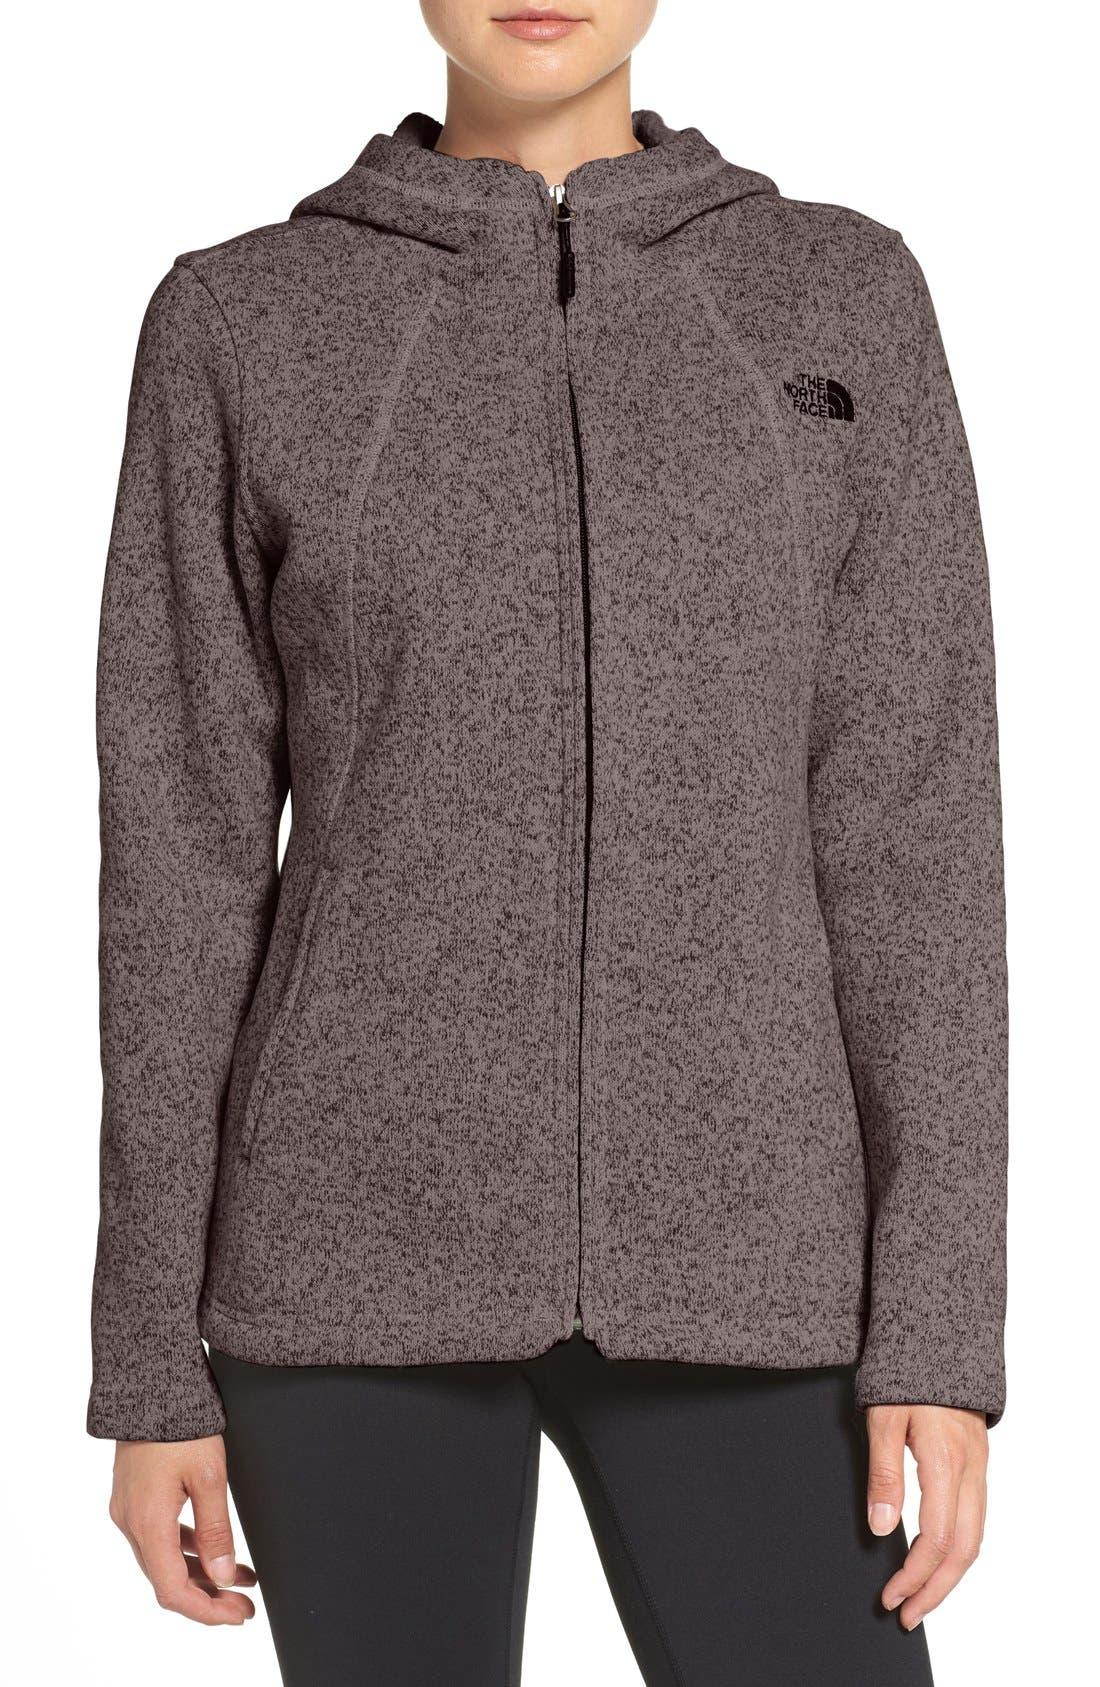 'Crescent' Fleece Jacket,                             Main thumbnail 3, color,